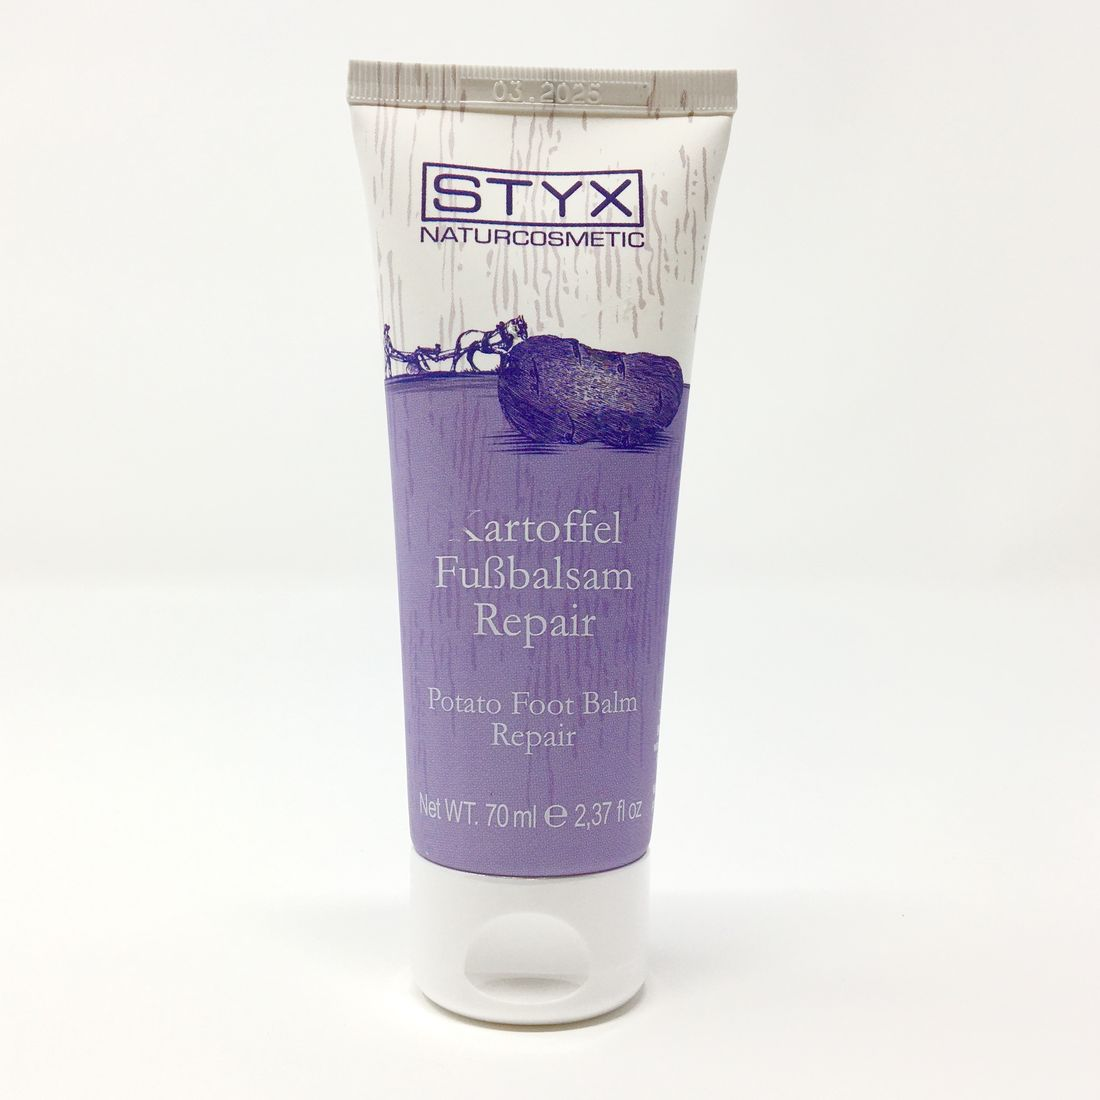 STYX Kartoffel Fußbalsam Repair 70ml (natürl. Duftnote: Lavendel)